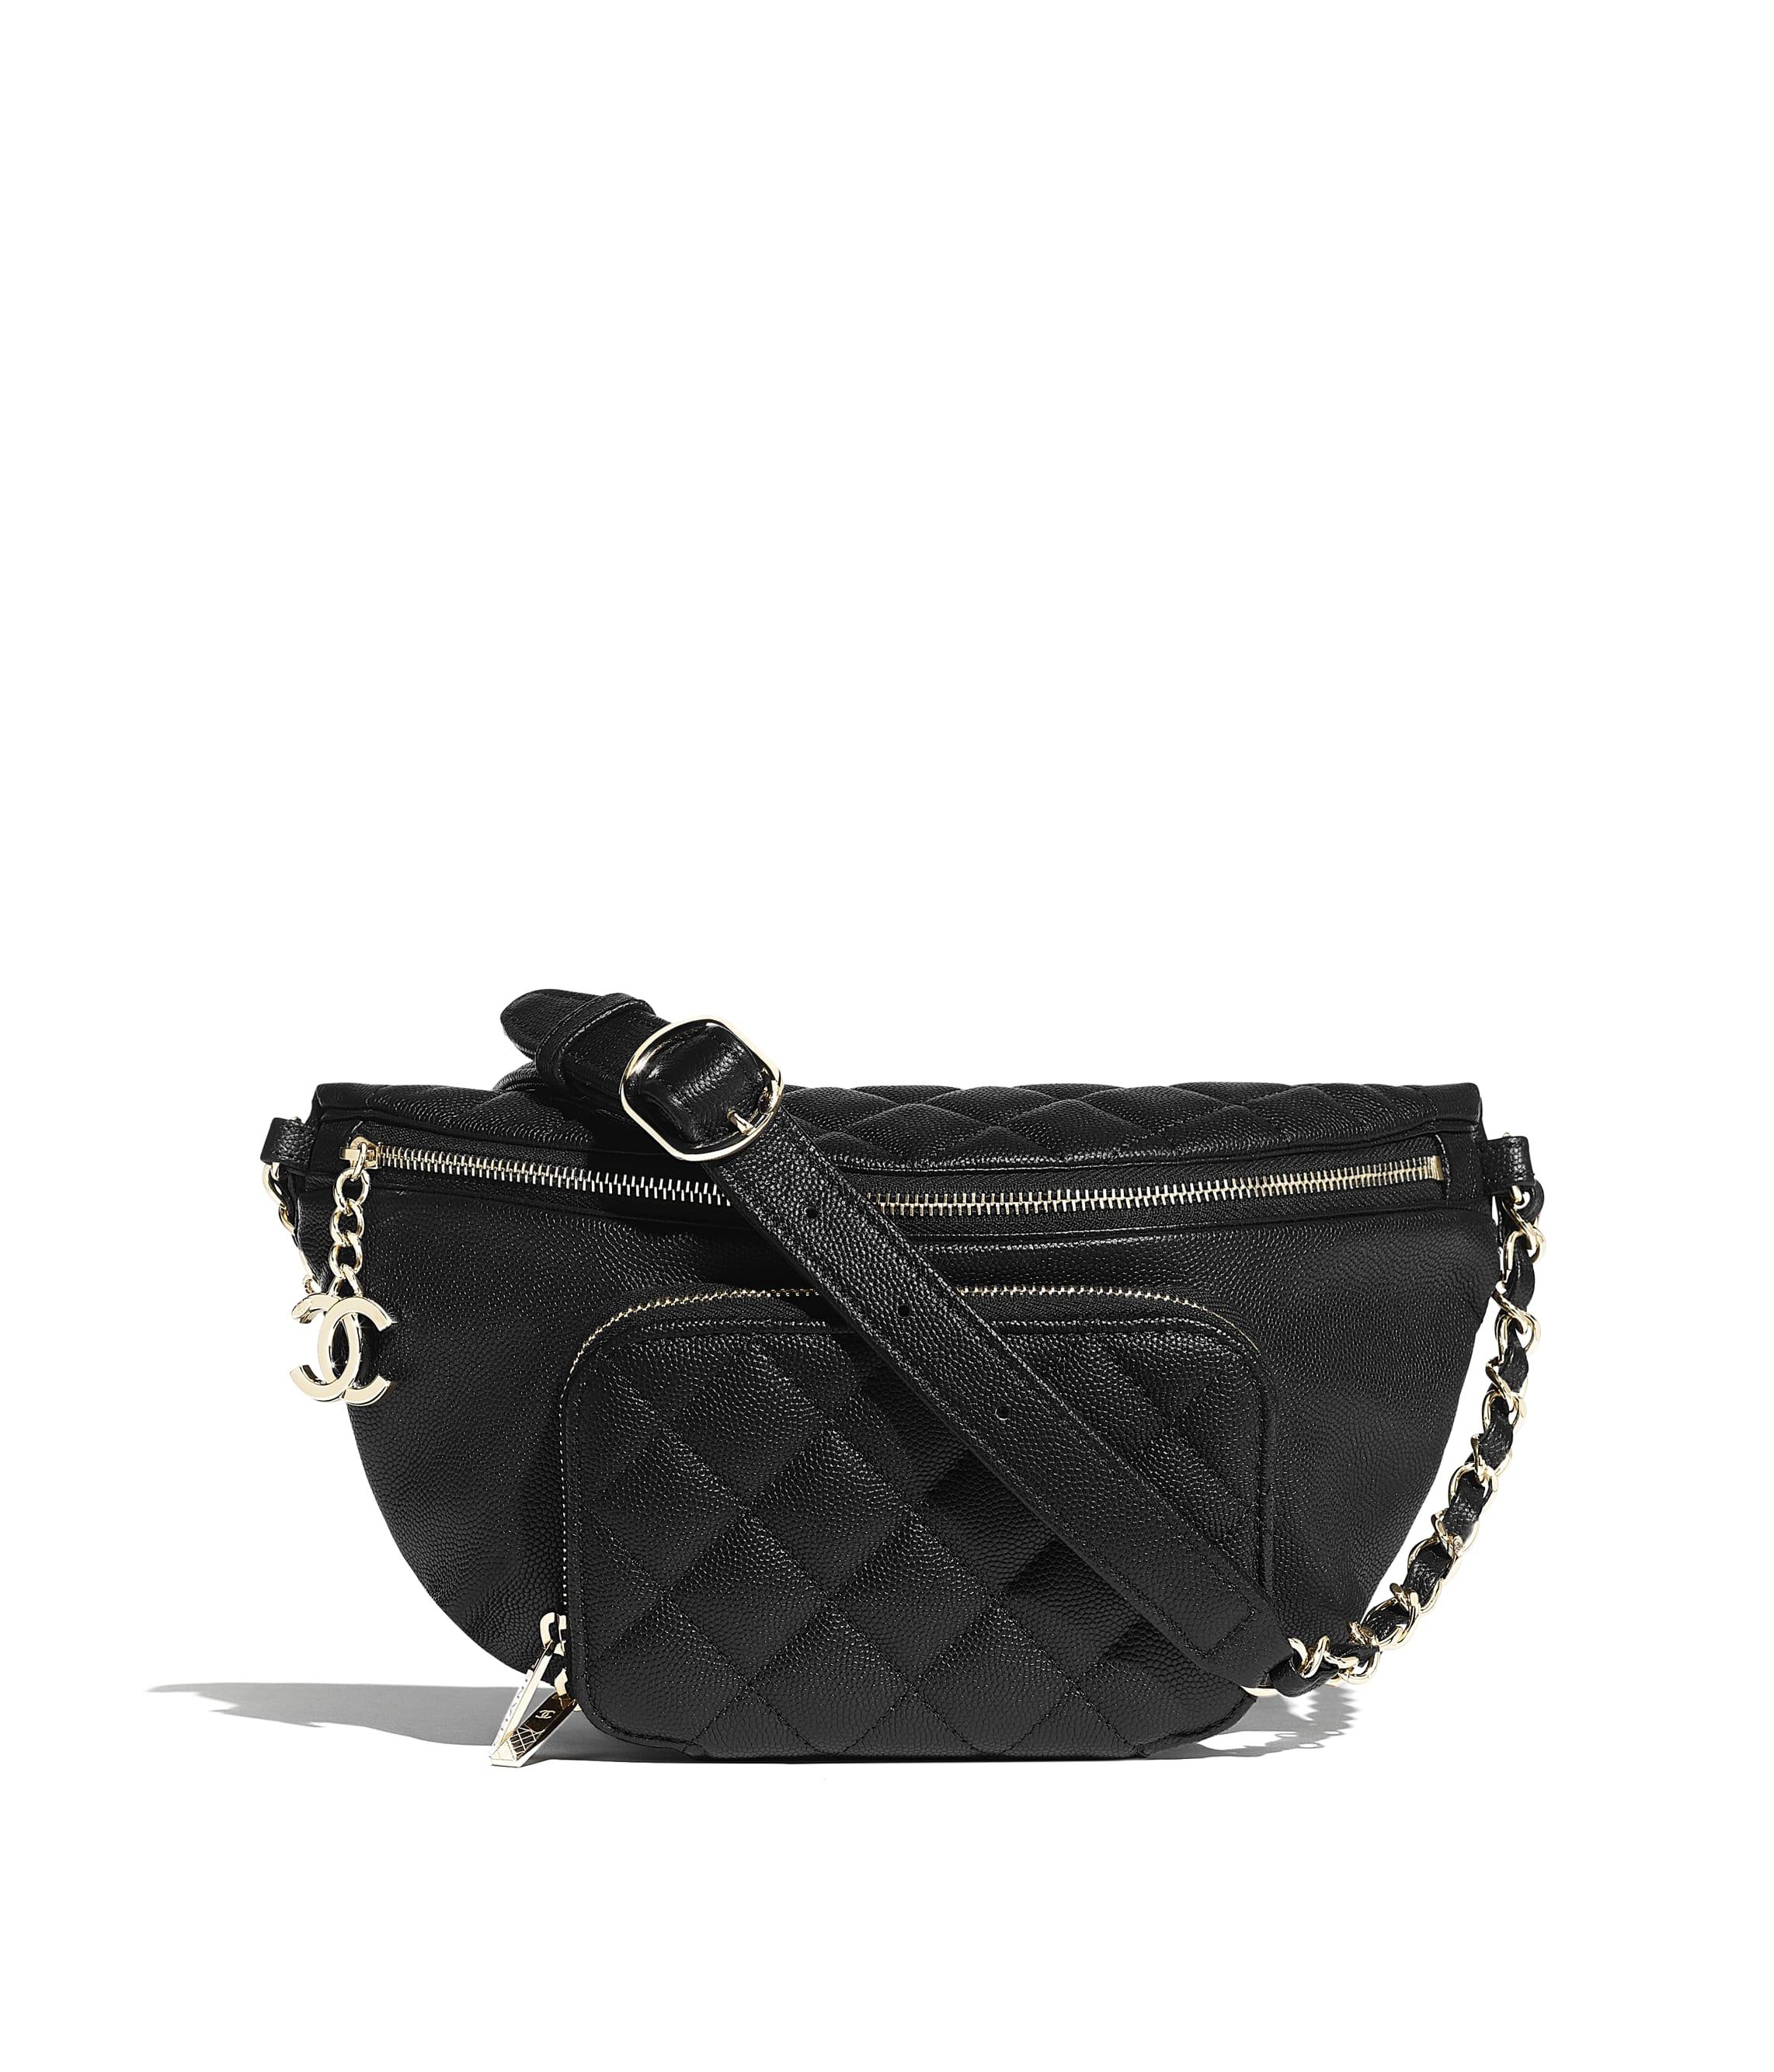 e6ec10521454 Waist Bag, grained calfskin & gold-tone metal, black - CHANEL